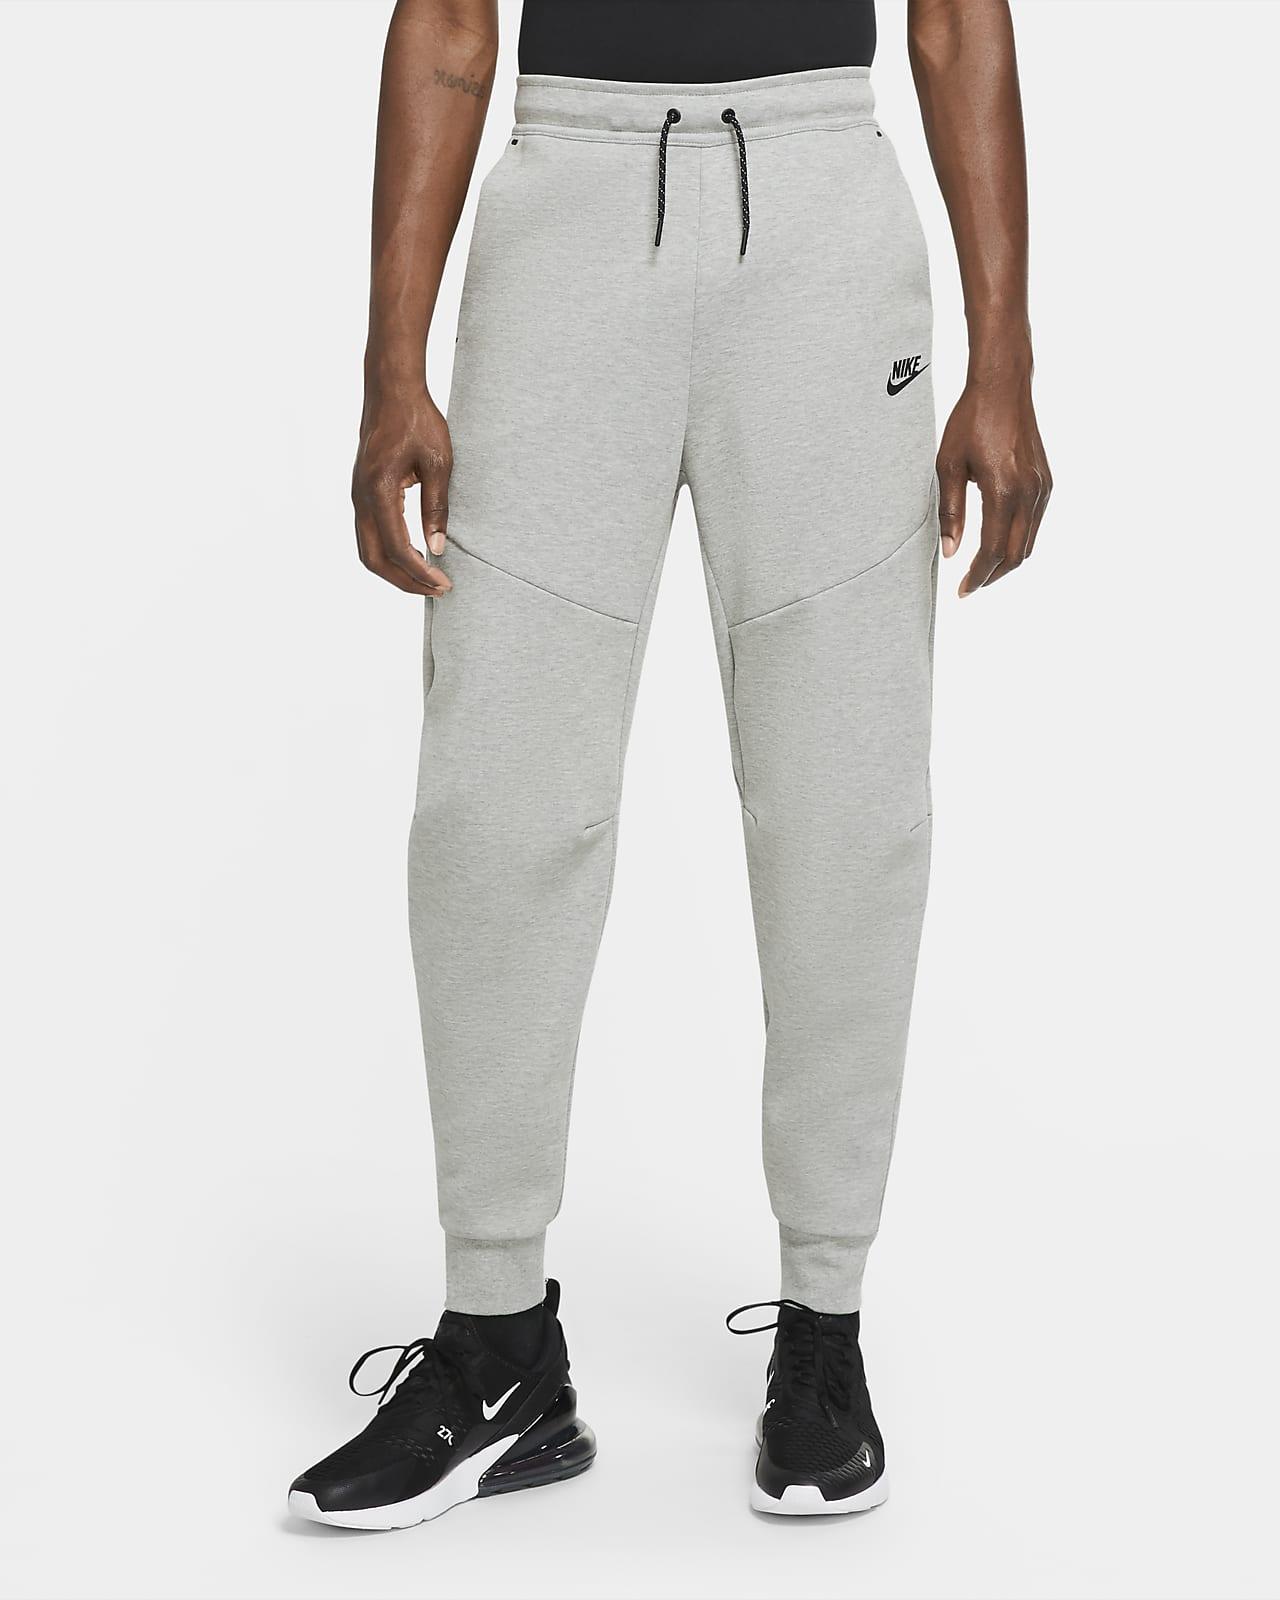 Pantaloni jogger Nike Sportswear Tech Fleece - Uomo